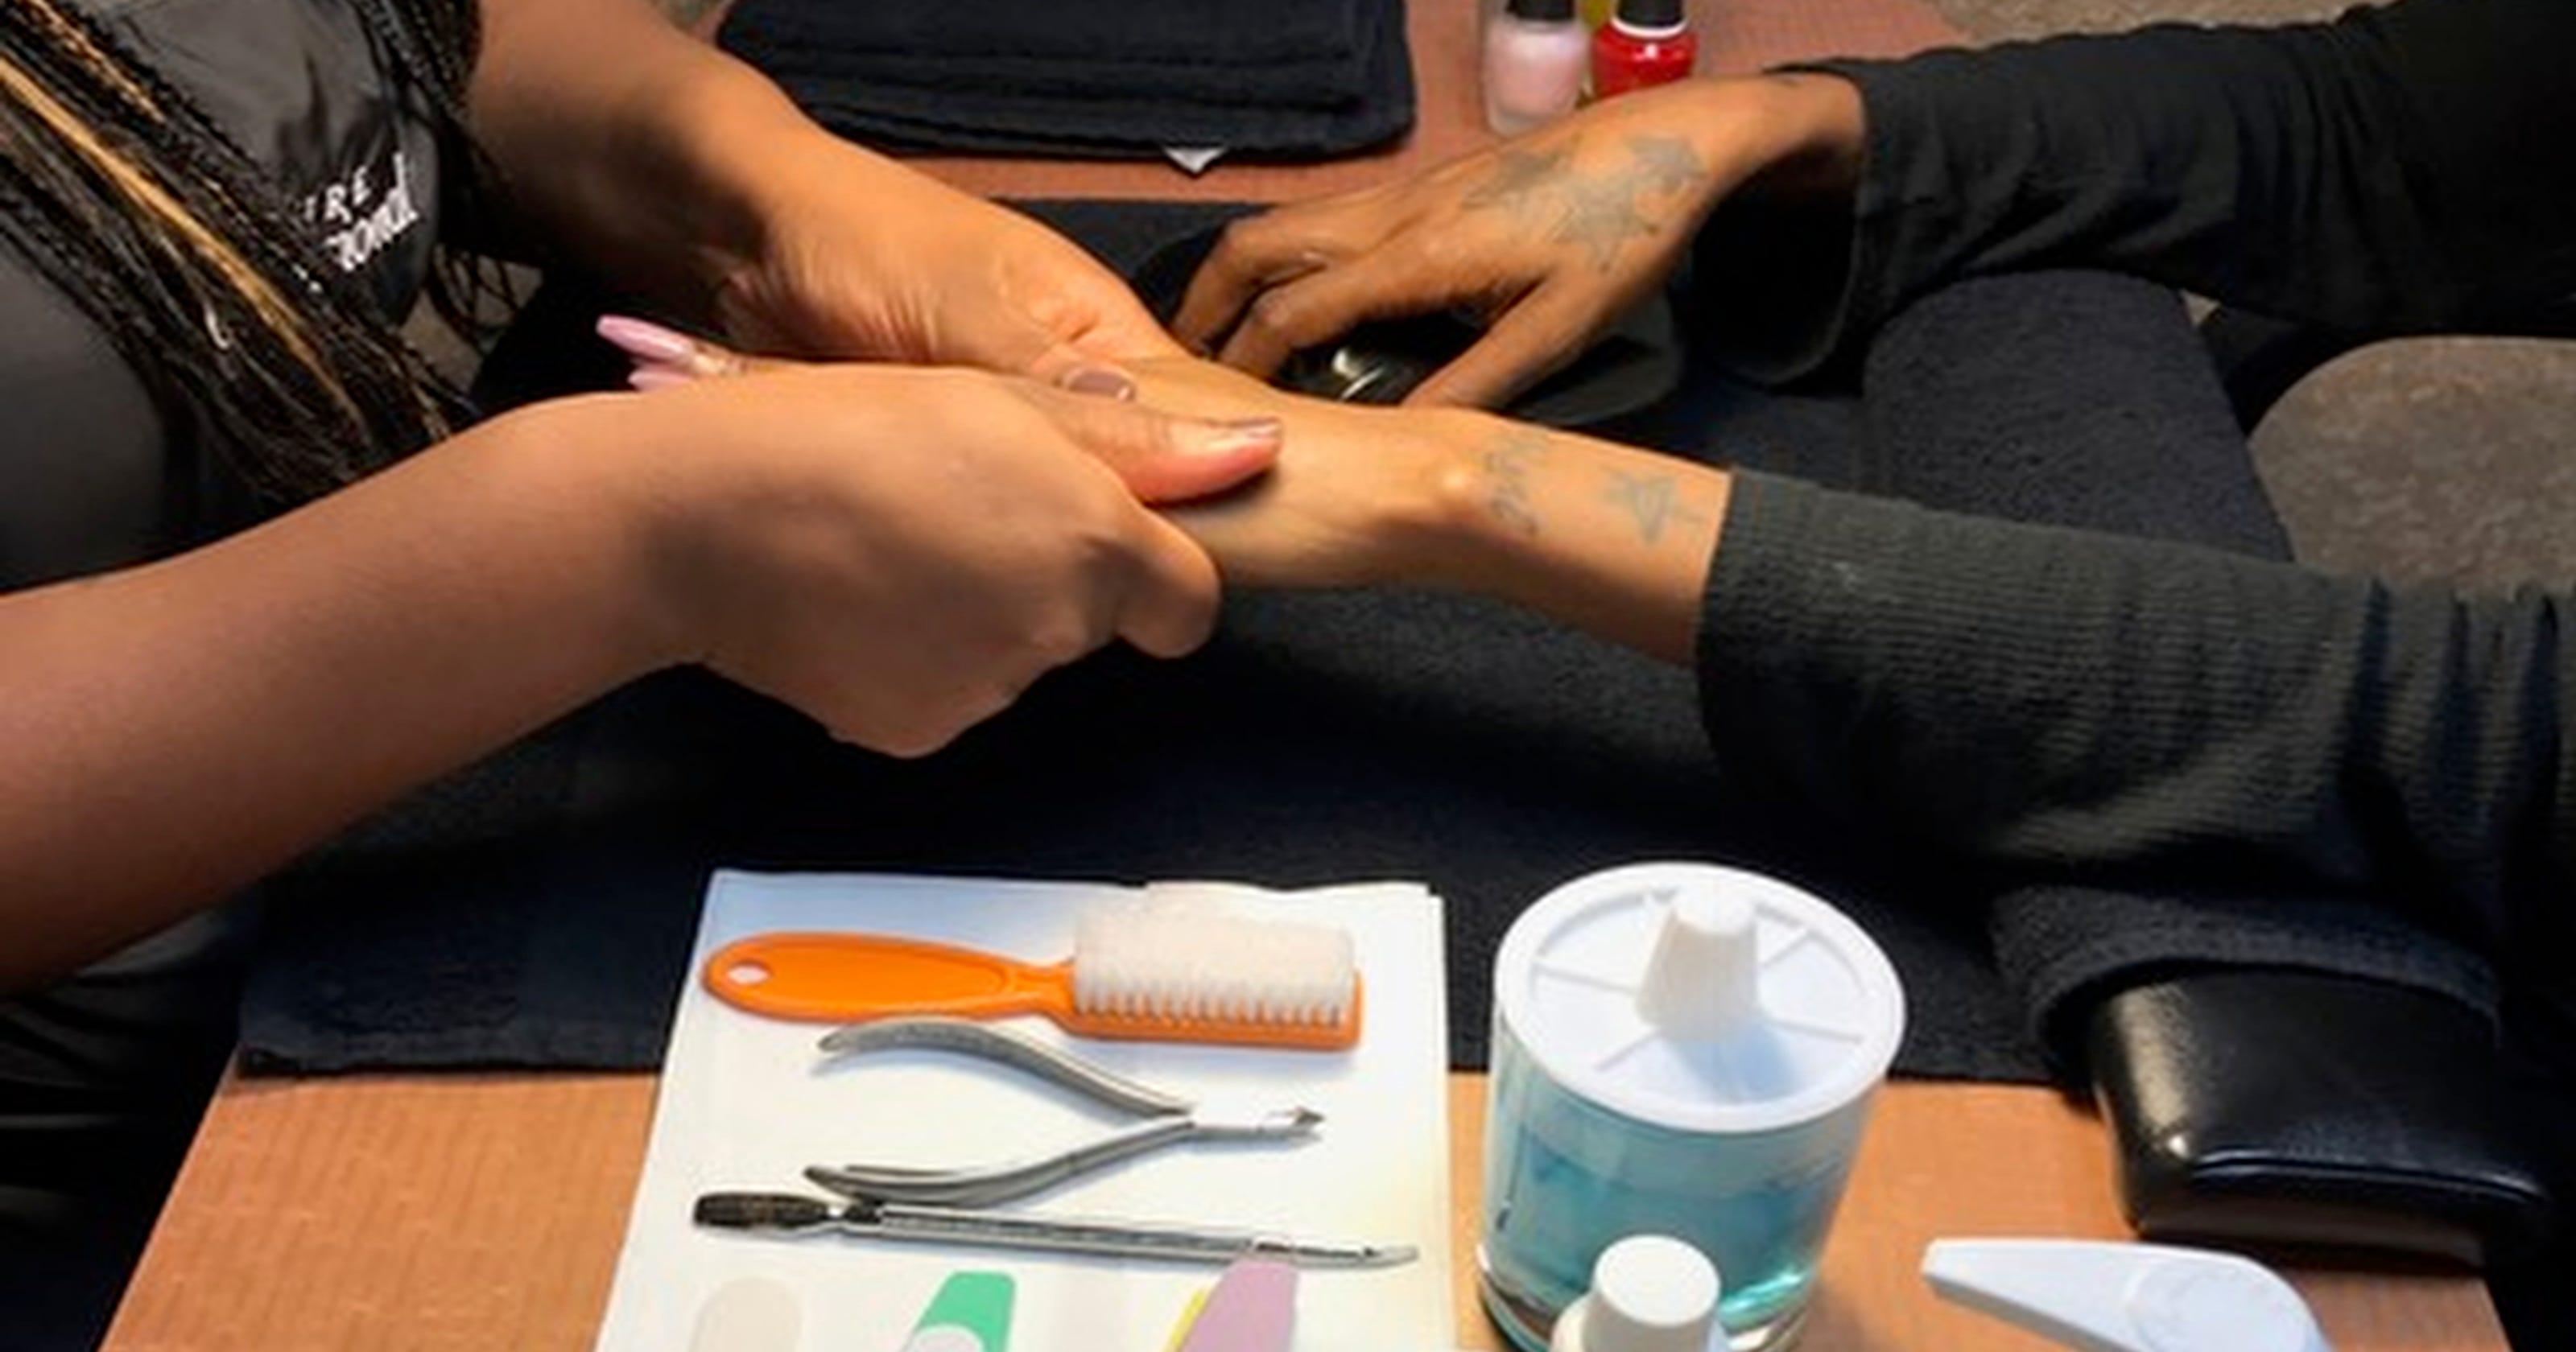 Beauty schools offer beauty on a budget